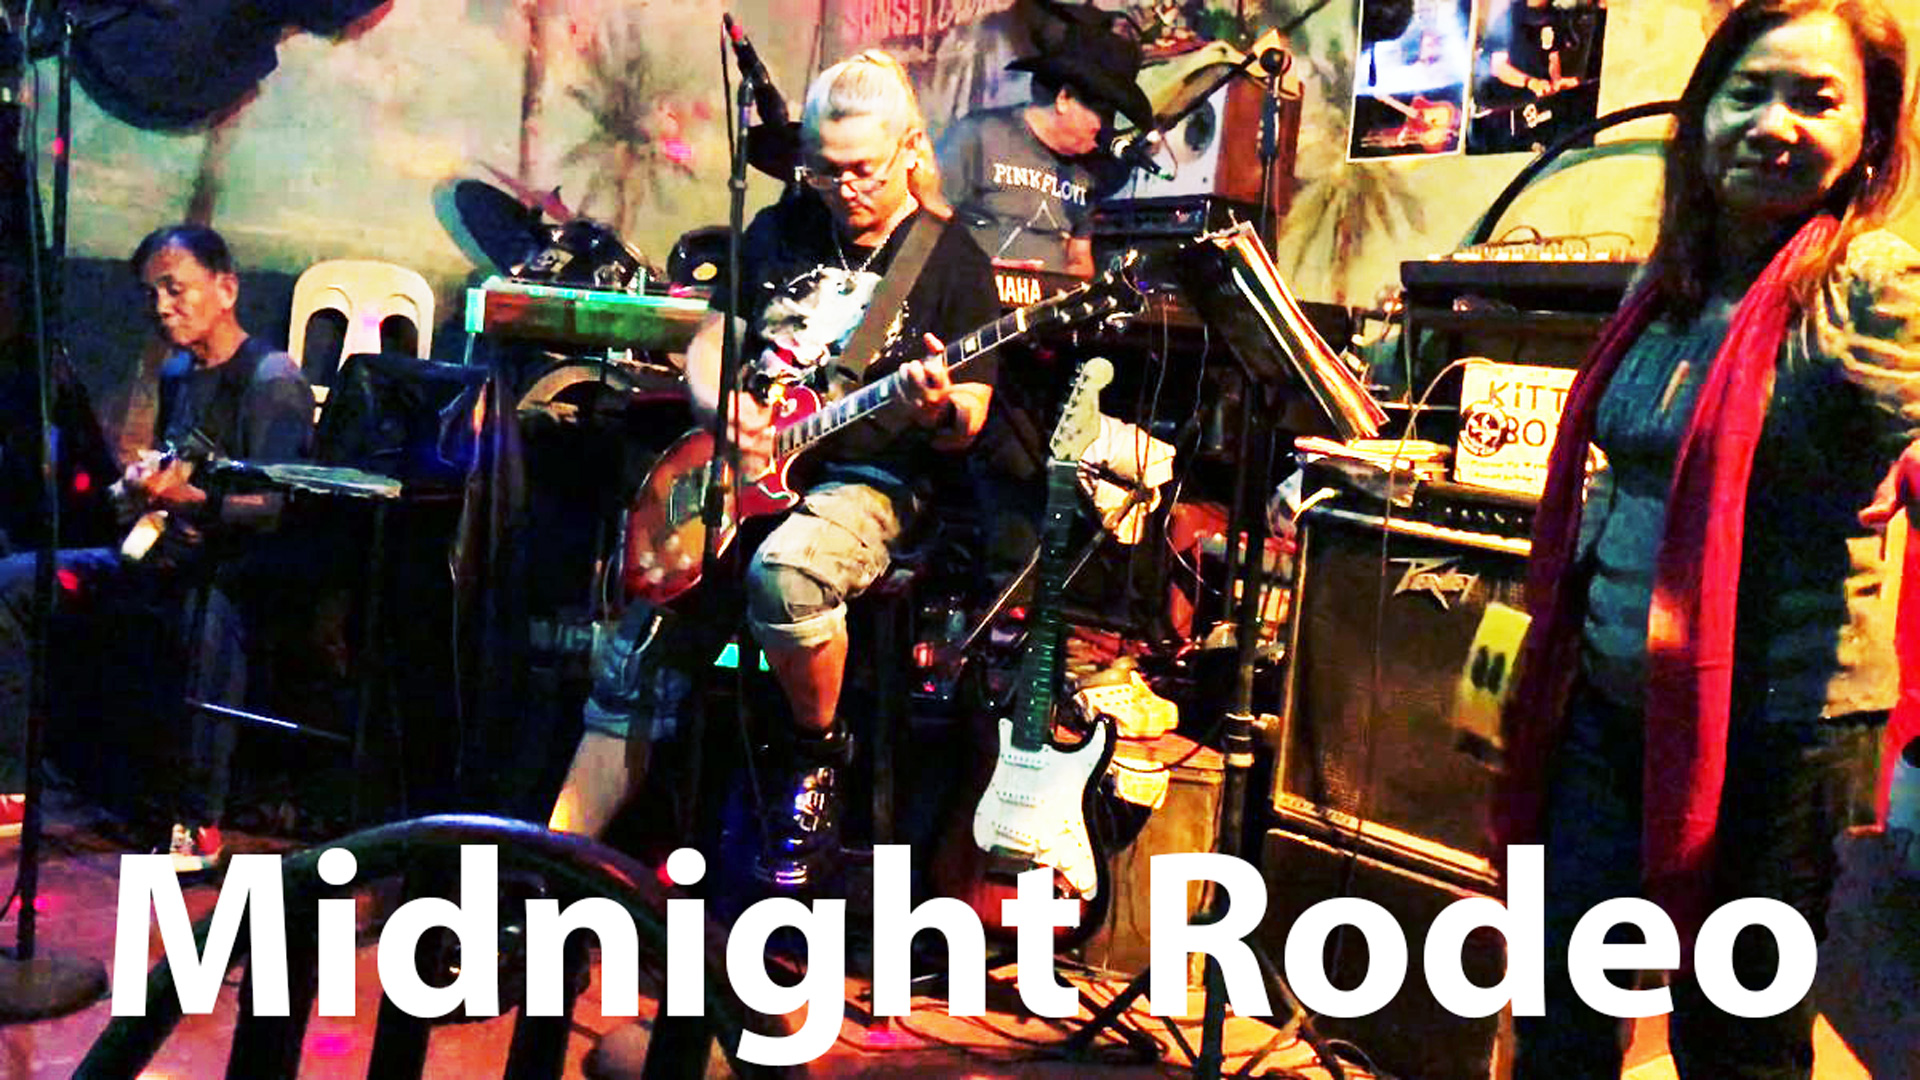 Midnight Rodeo - Angeles City, Philippines